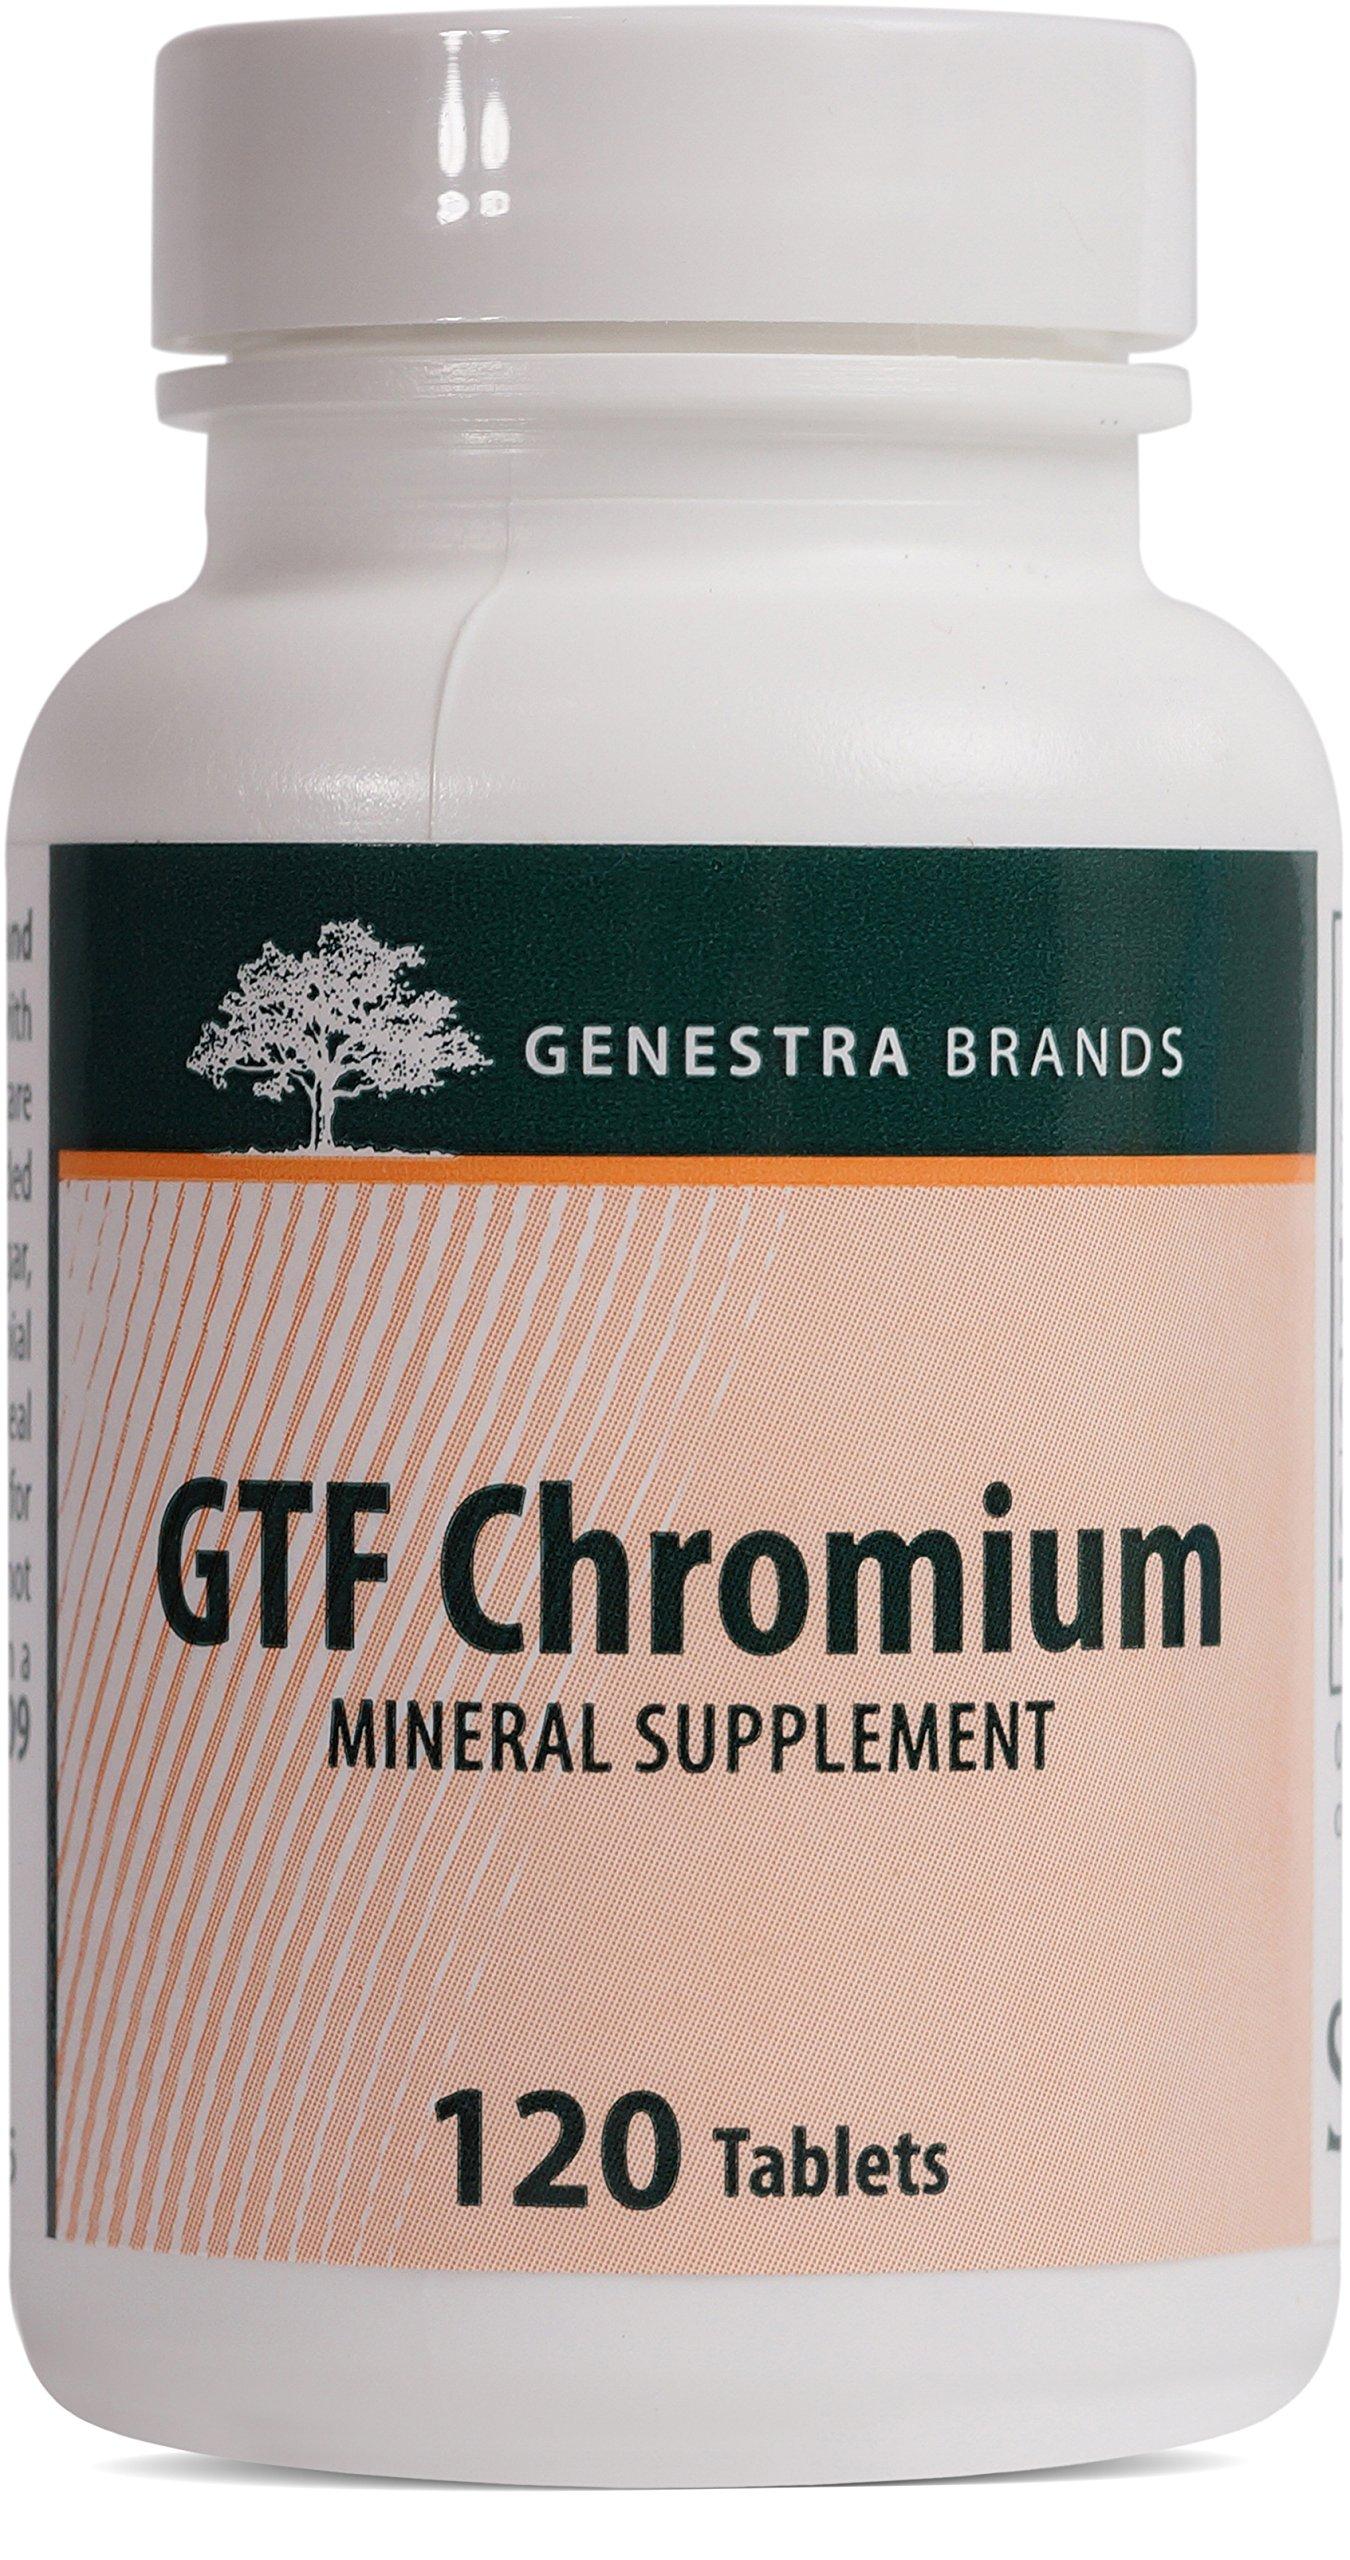 Genestra Brands - GTF Chromium - Support for Healthy Glucose Metabolism* - 120 Tablets